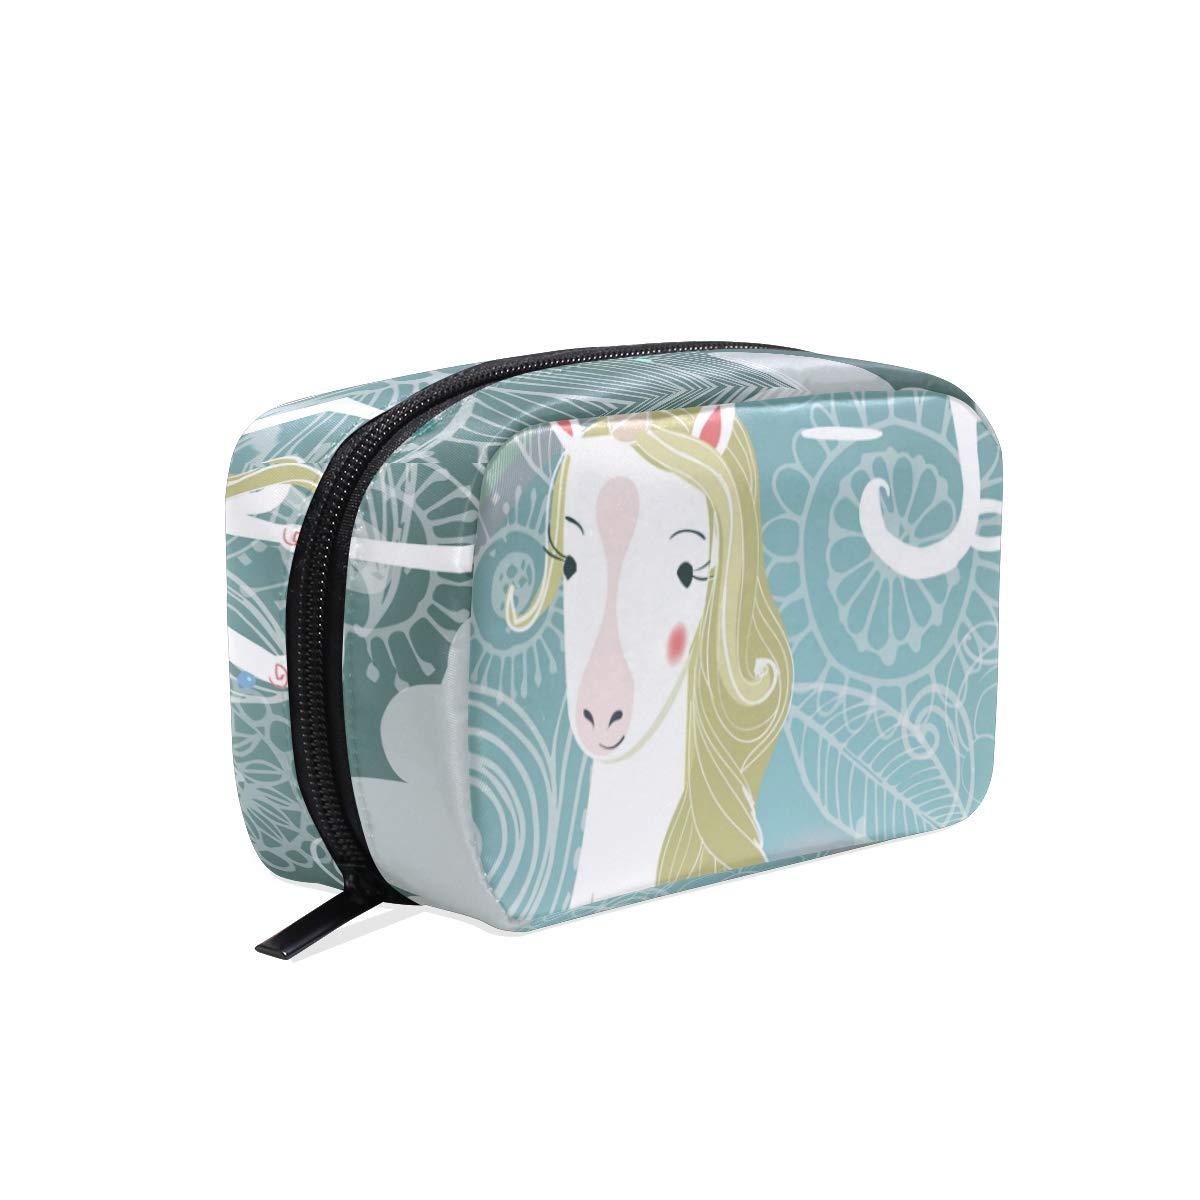 Cosmetic Makeup Bag Pouch Dreams Big Cute Unicorn Clutch